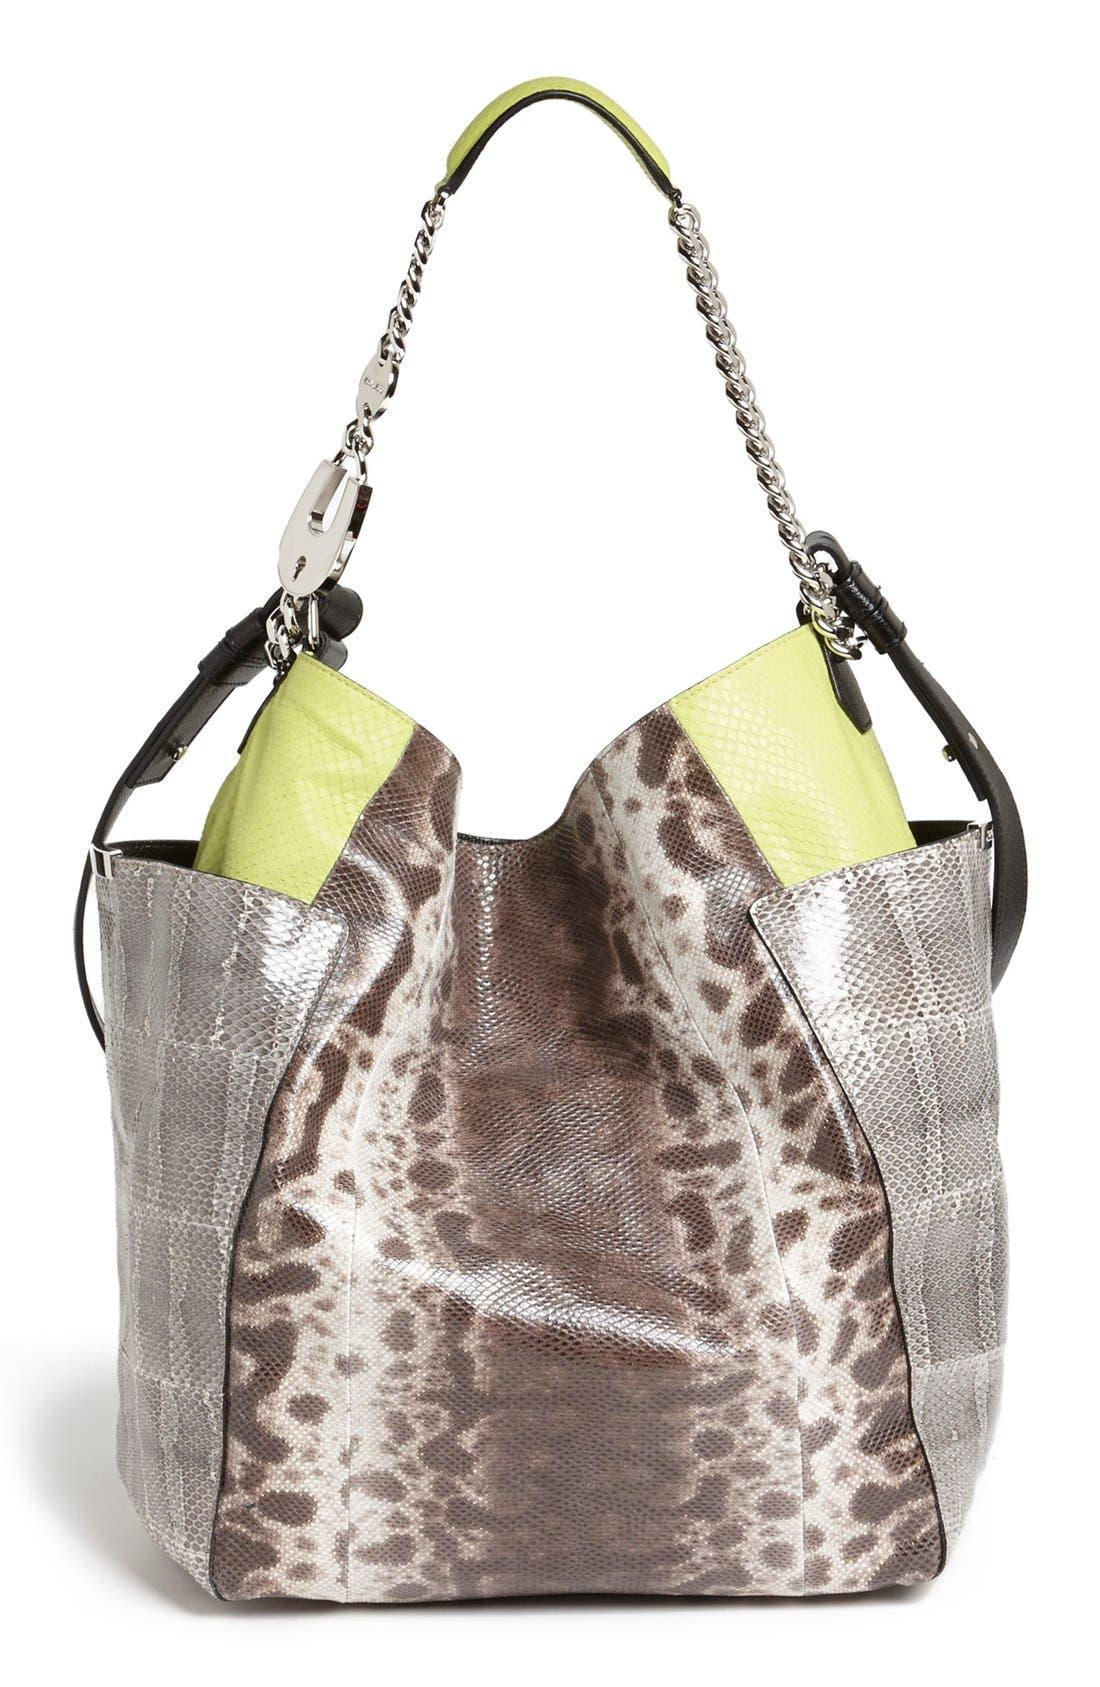 Main Image - Jimmy Choo 'Anna' Shoulder Bag